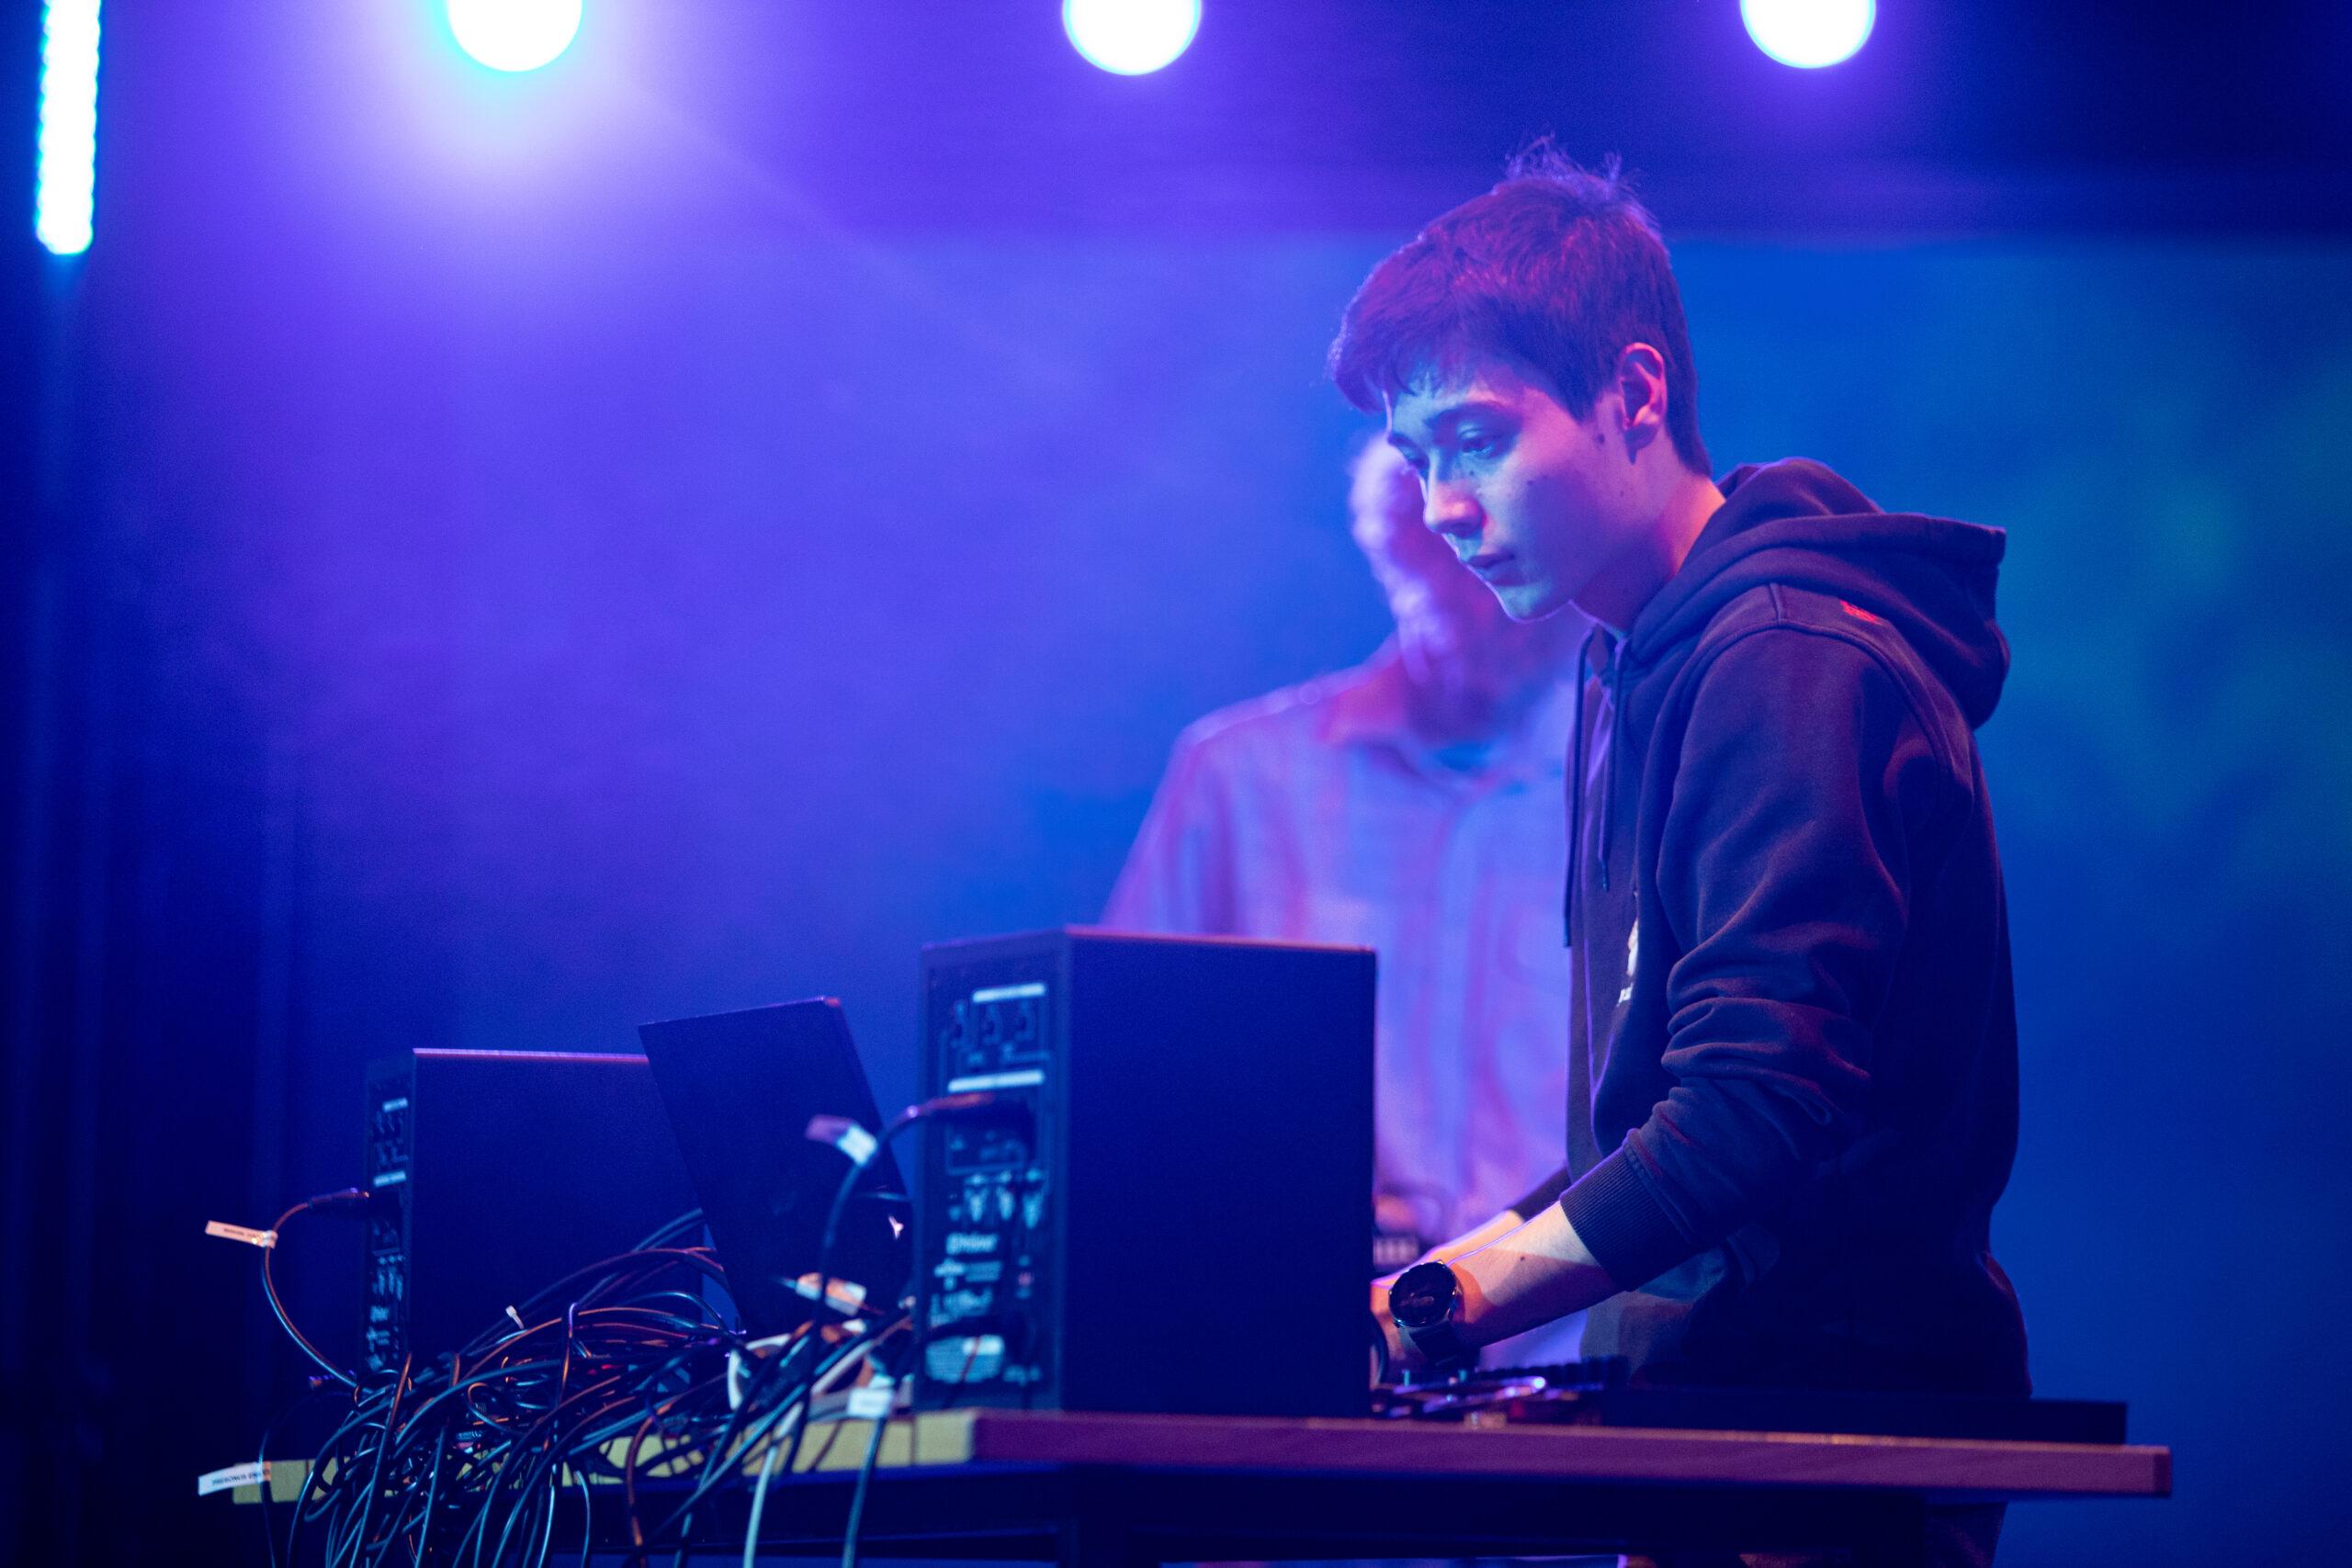 Bliv DJ på efterskole